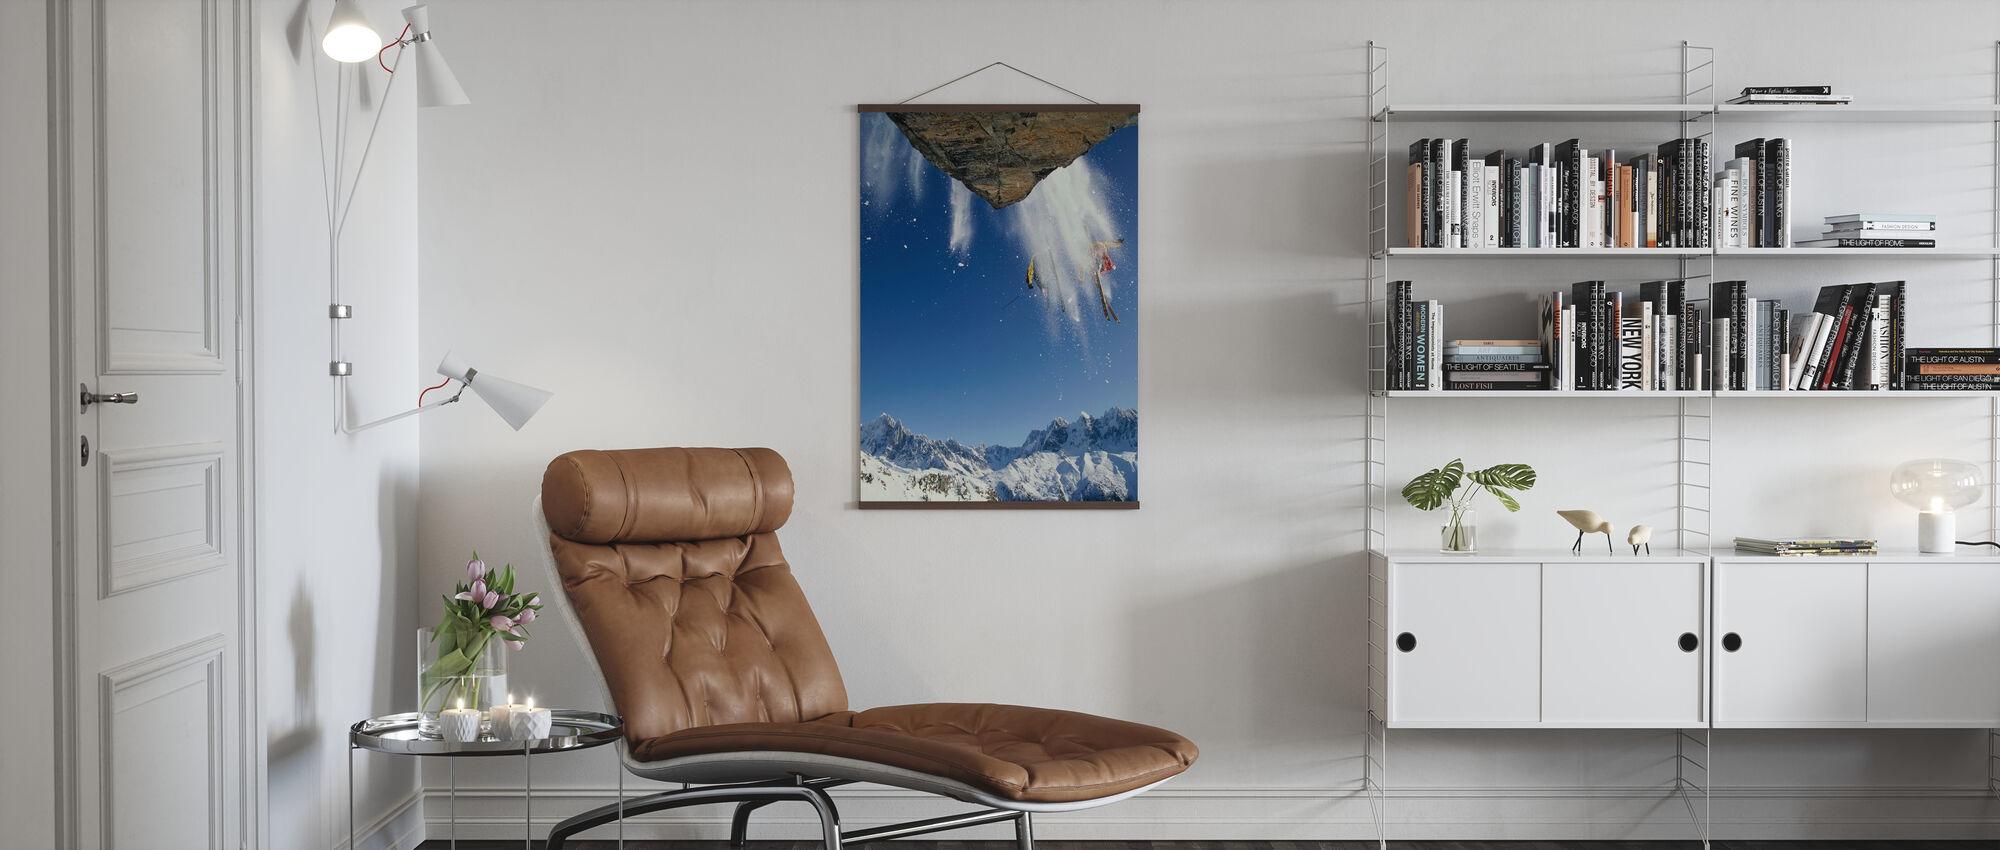 Pois Piste Hiihto Mont Blanc - Juliste - Olohuone